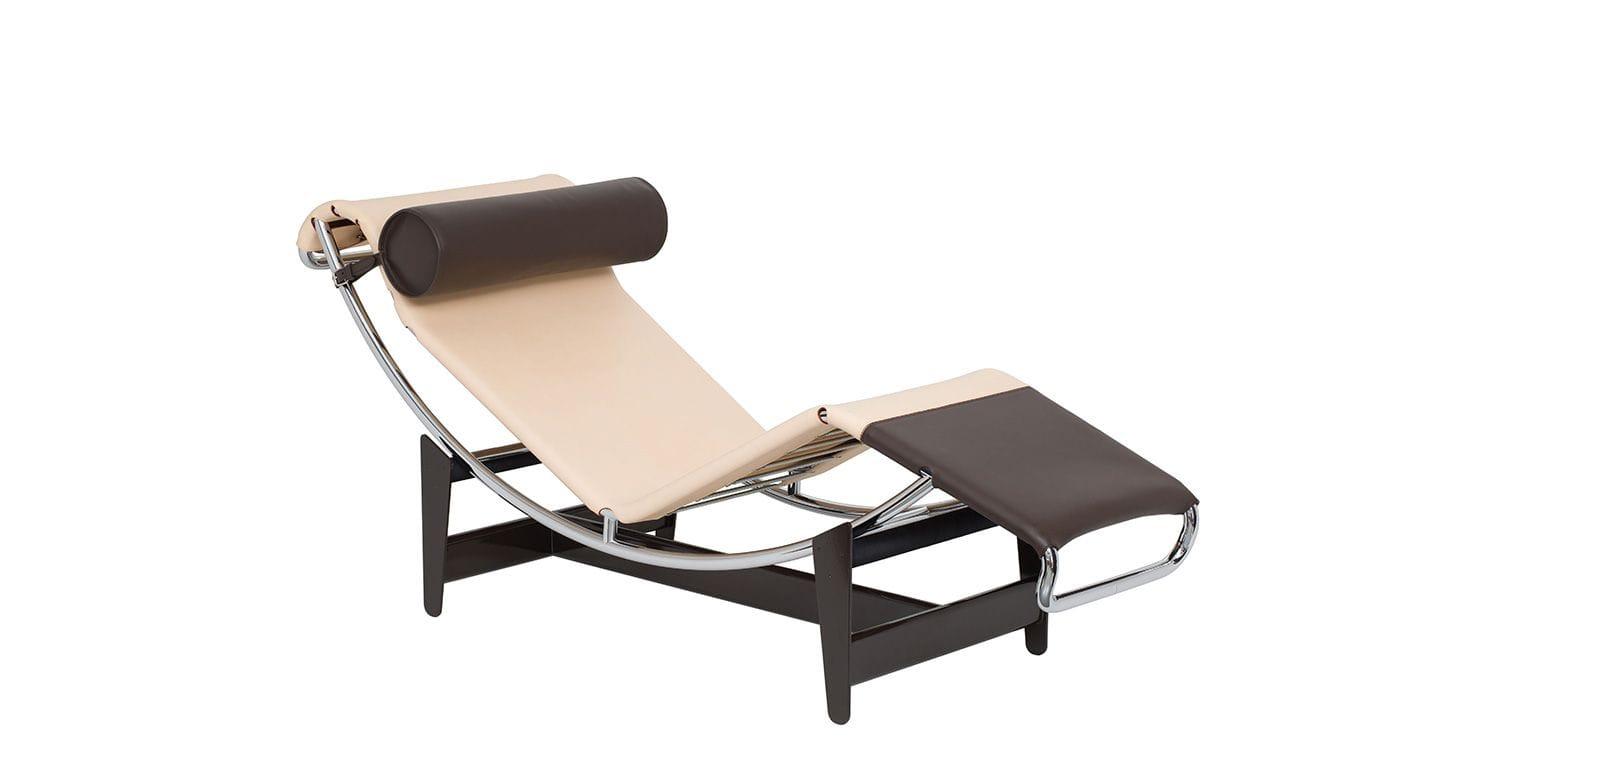 dition limit e de la chaise longue lc4 lv de cassina silvera. Black Bedroom Furniture Sets. Home Design Ideas